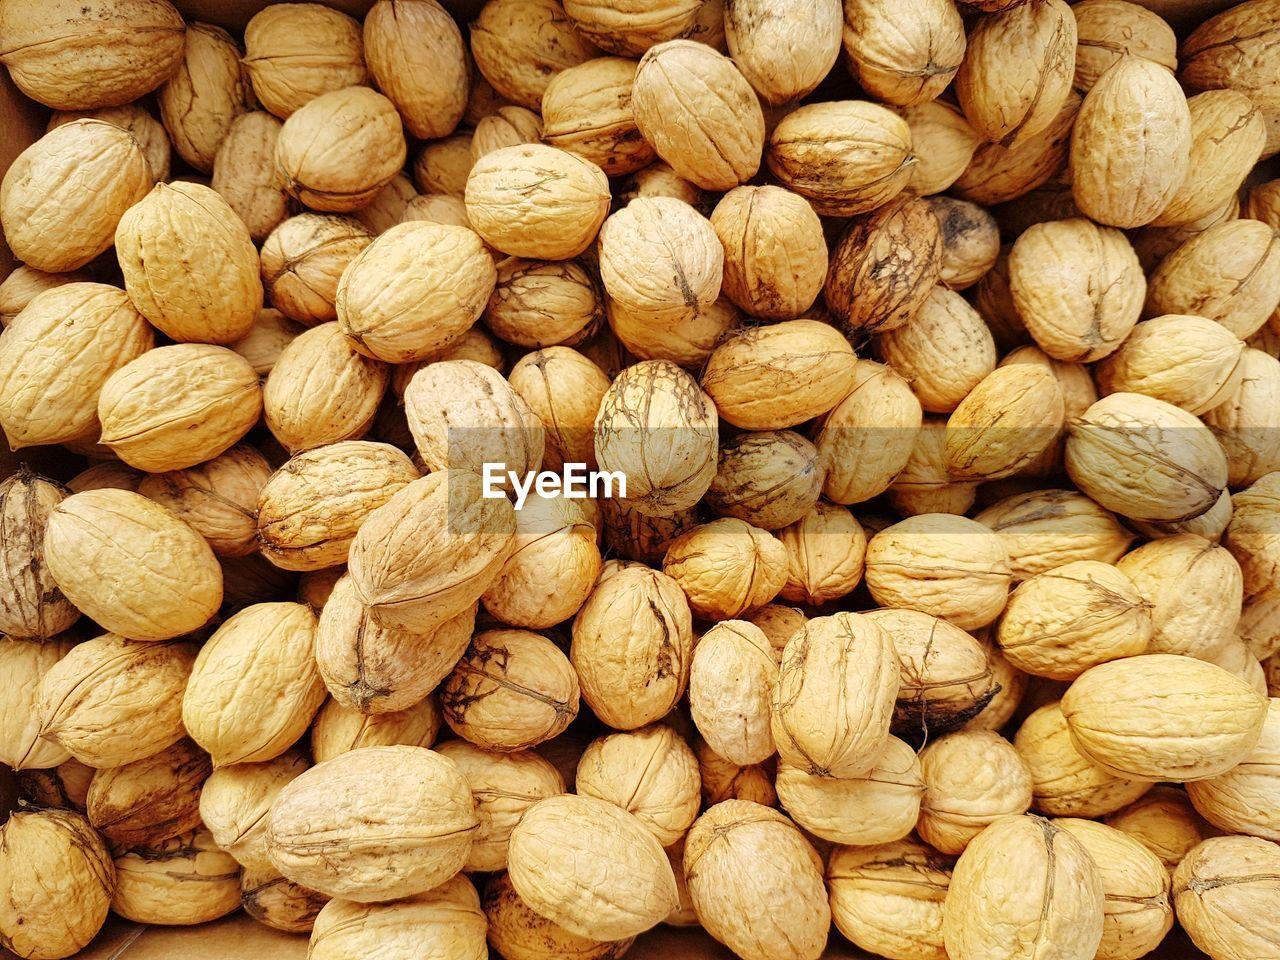 Full frame shot of walnuts